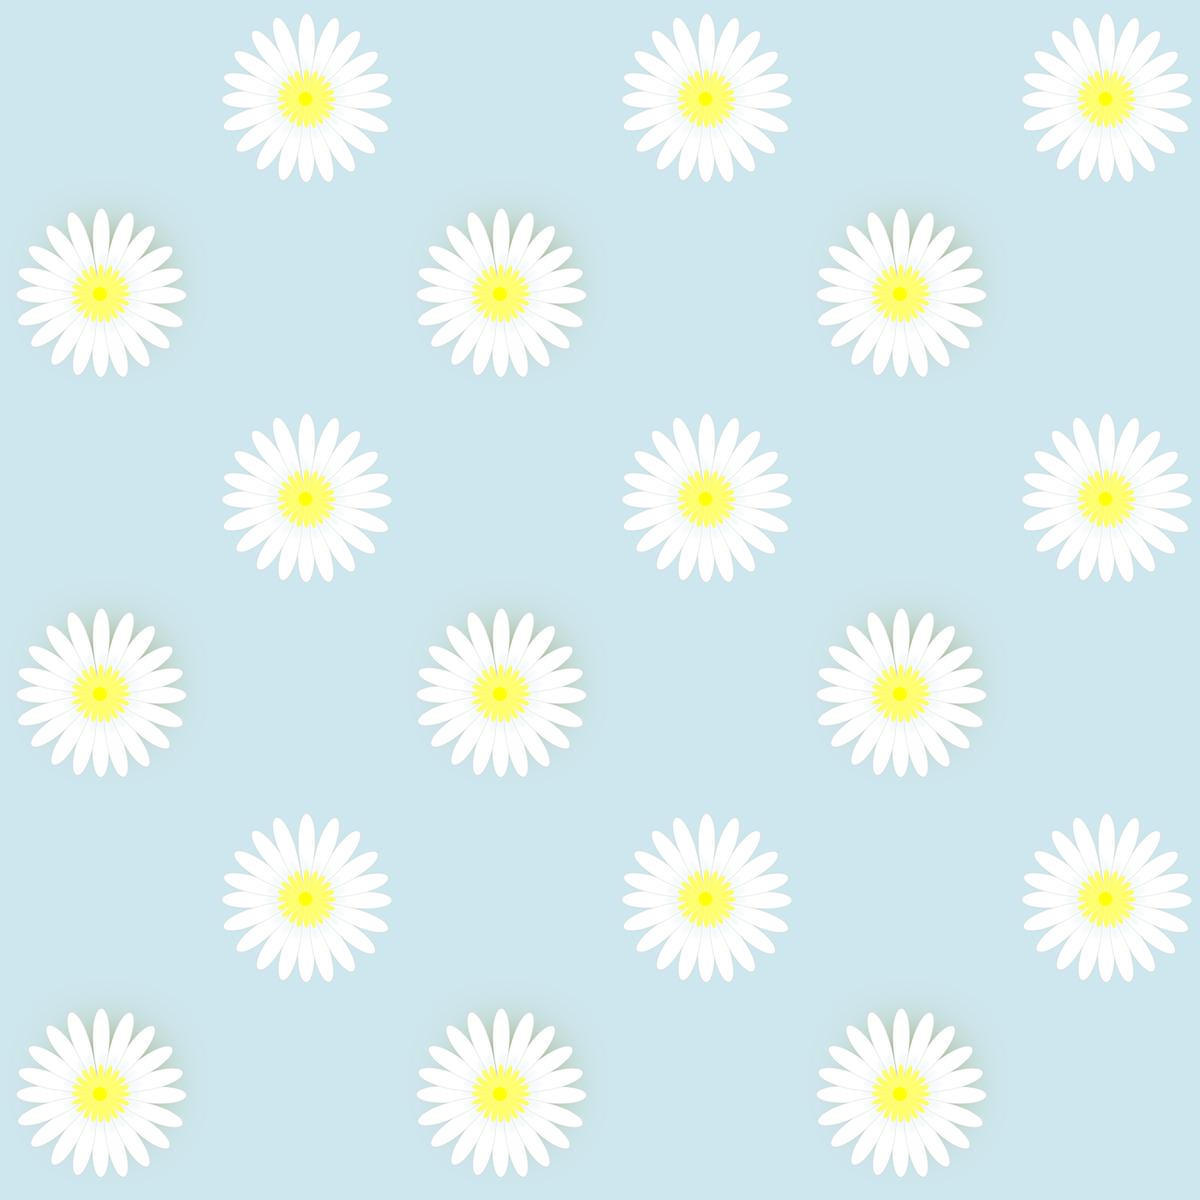 Free Digital Daisy Flower Scrapbooking Papers Ausdruckbare